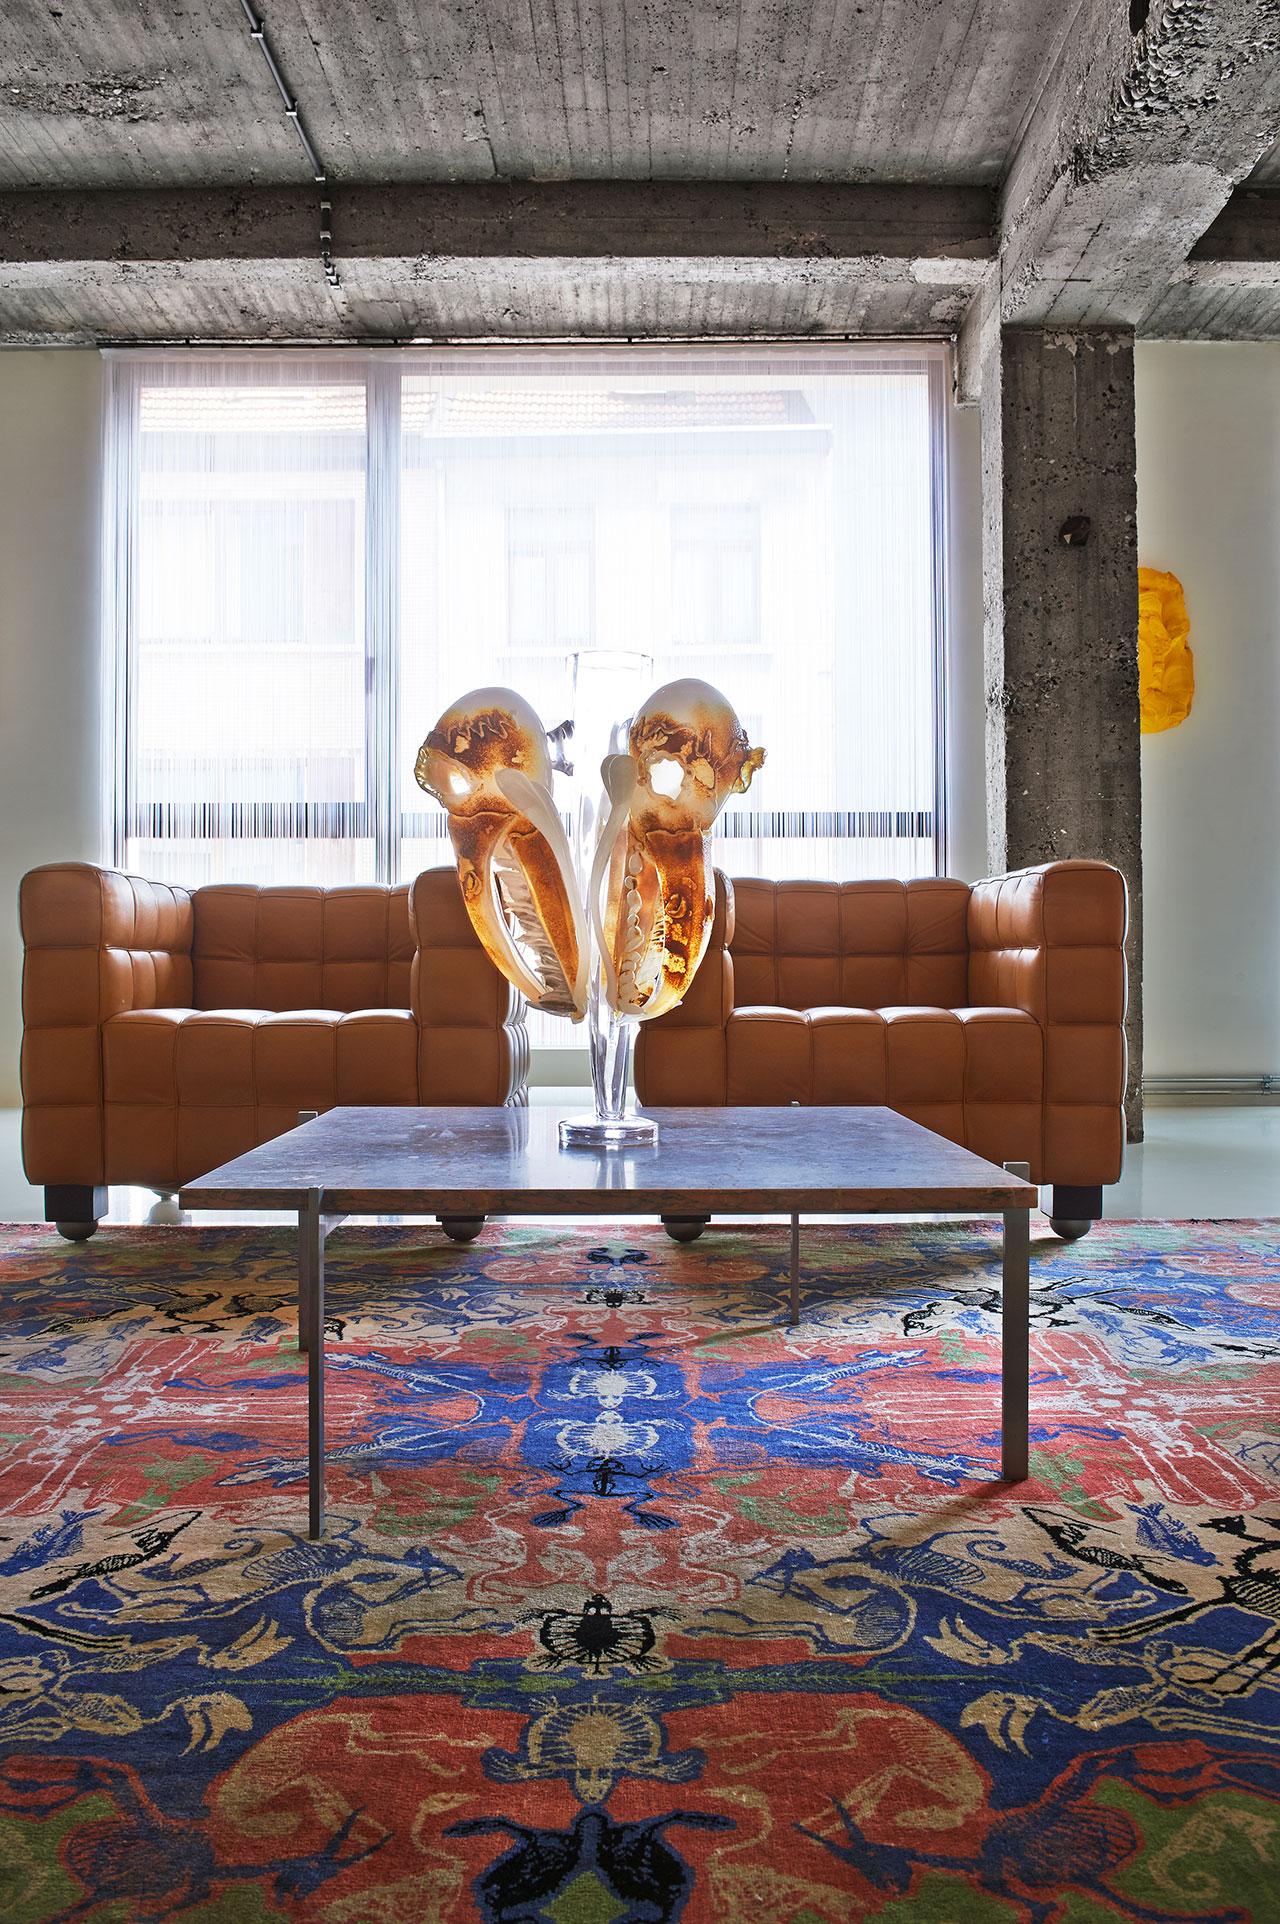 Living room. Carpet: Perished, Studio Job for Nodus, 2010. Coffee table: PK 61 Poul Kjaerholm, 1956. Vase: Boris Sipek, 2000.Bank: Cube, Joseph Hoffmann, 1910.Bronze: Diamond, Studio Job, 2002.Painting: Yellow, Bram Bogart, 2007.Photo by Dennis Brandsma.